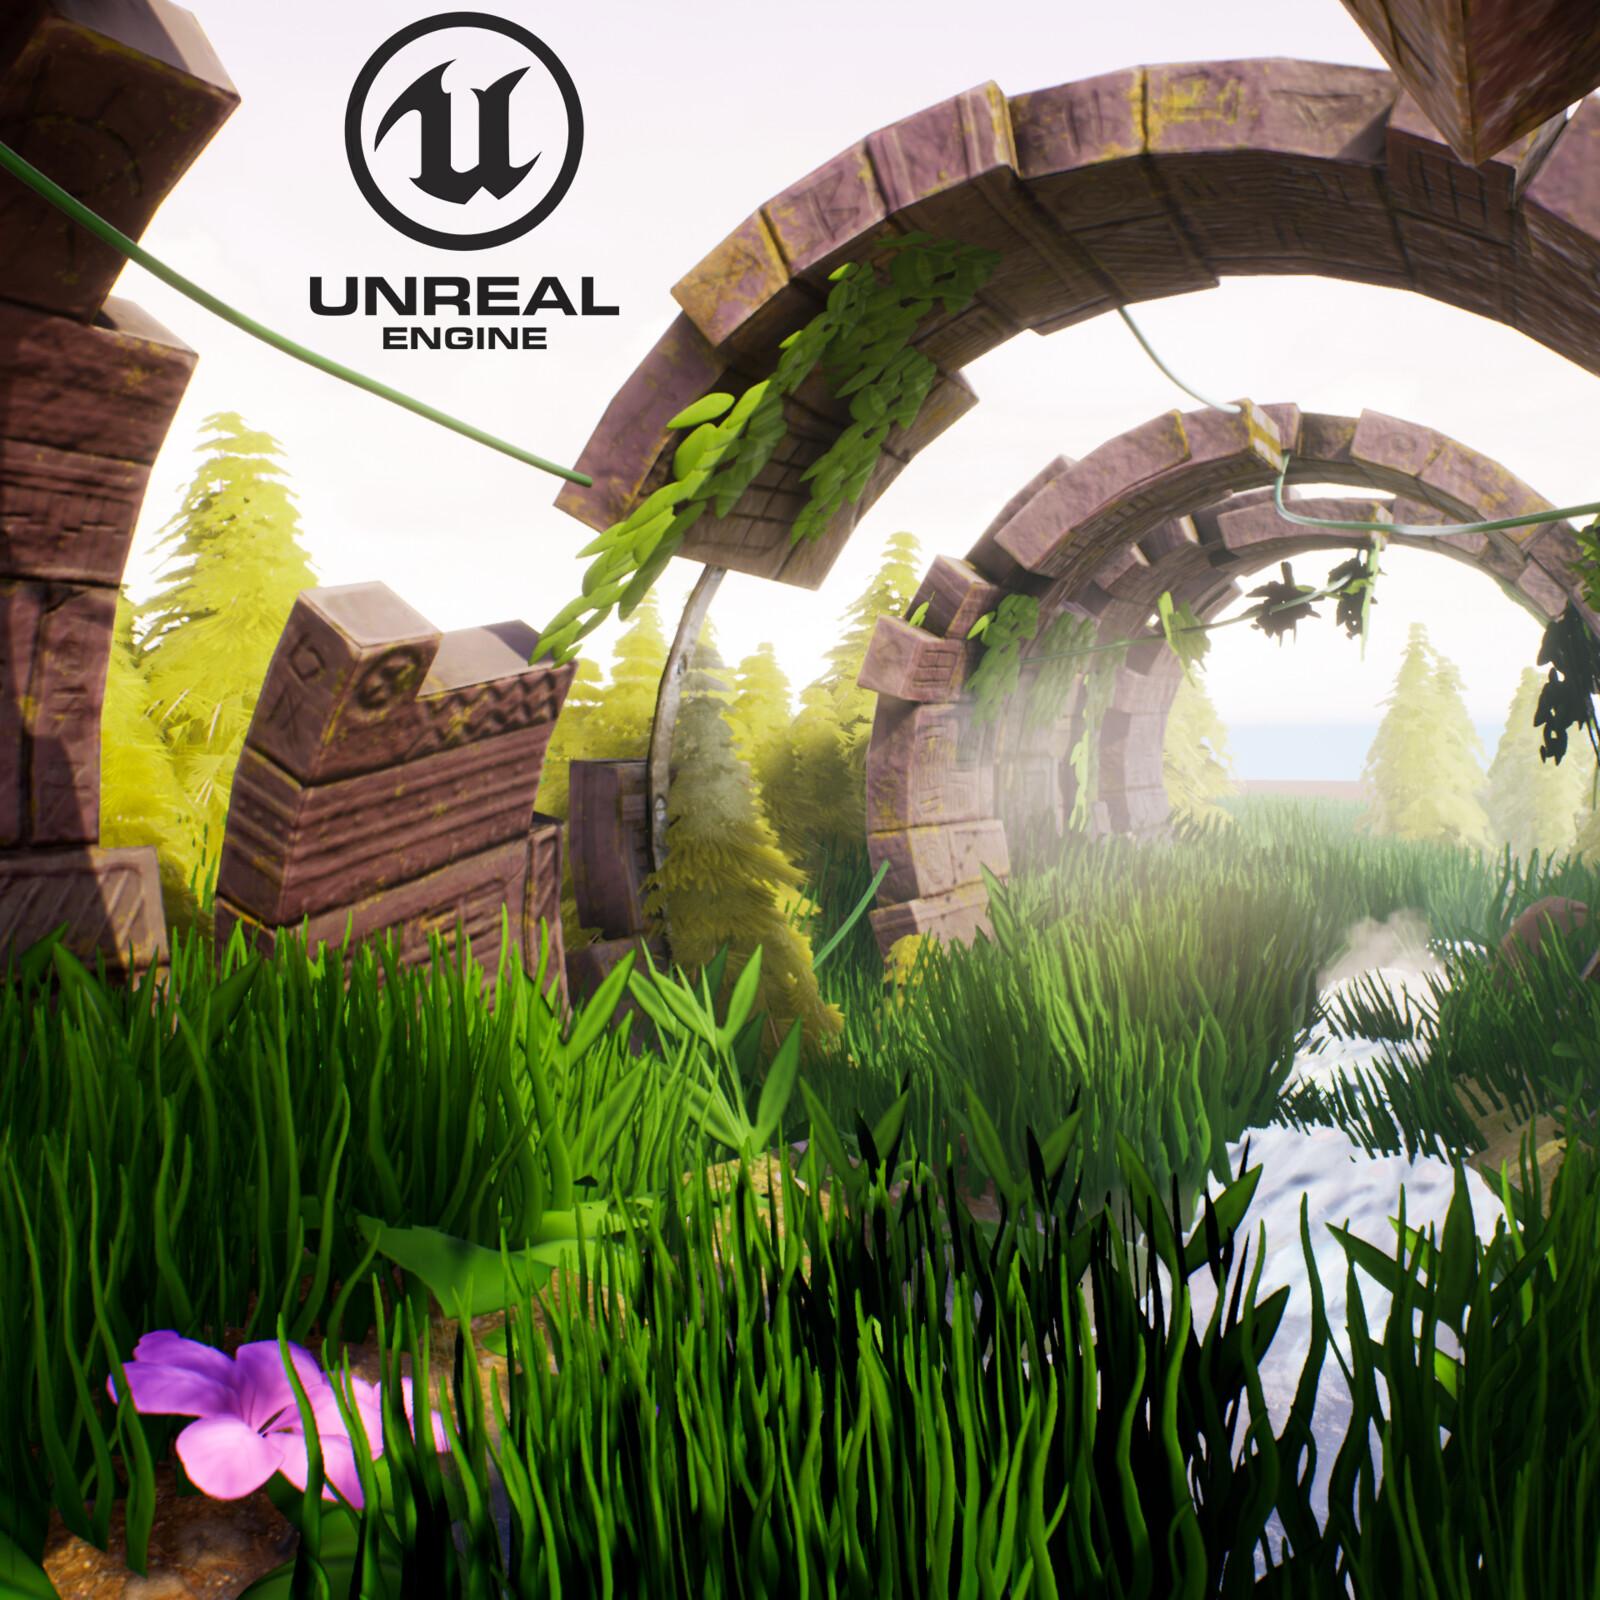 Lost Temple woods - Full 3D Environment development